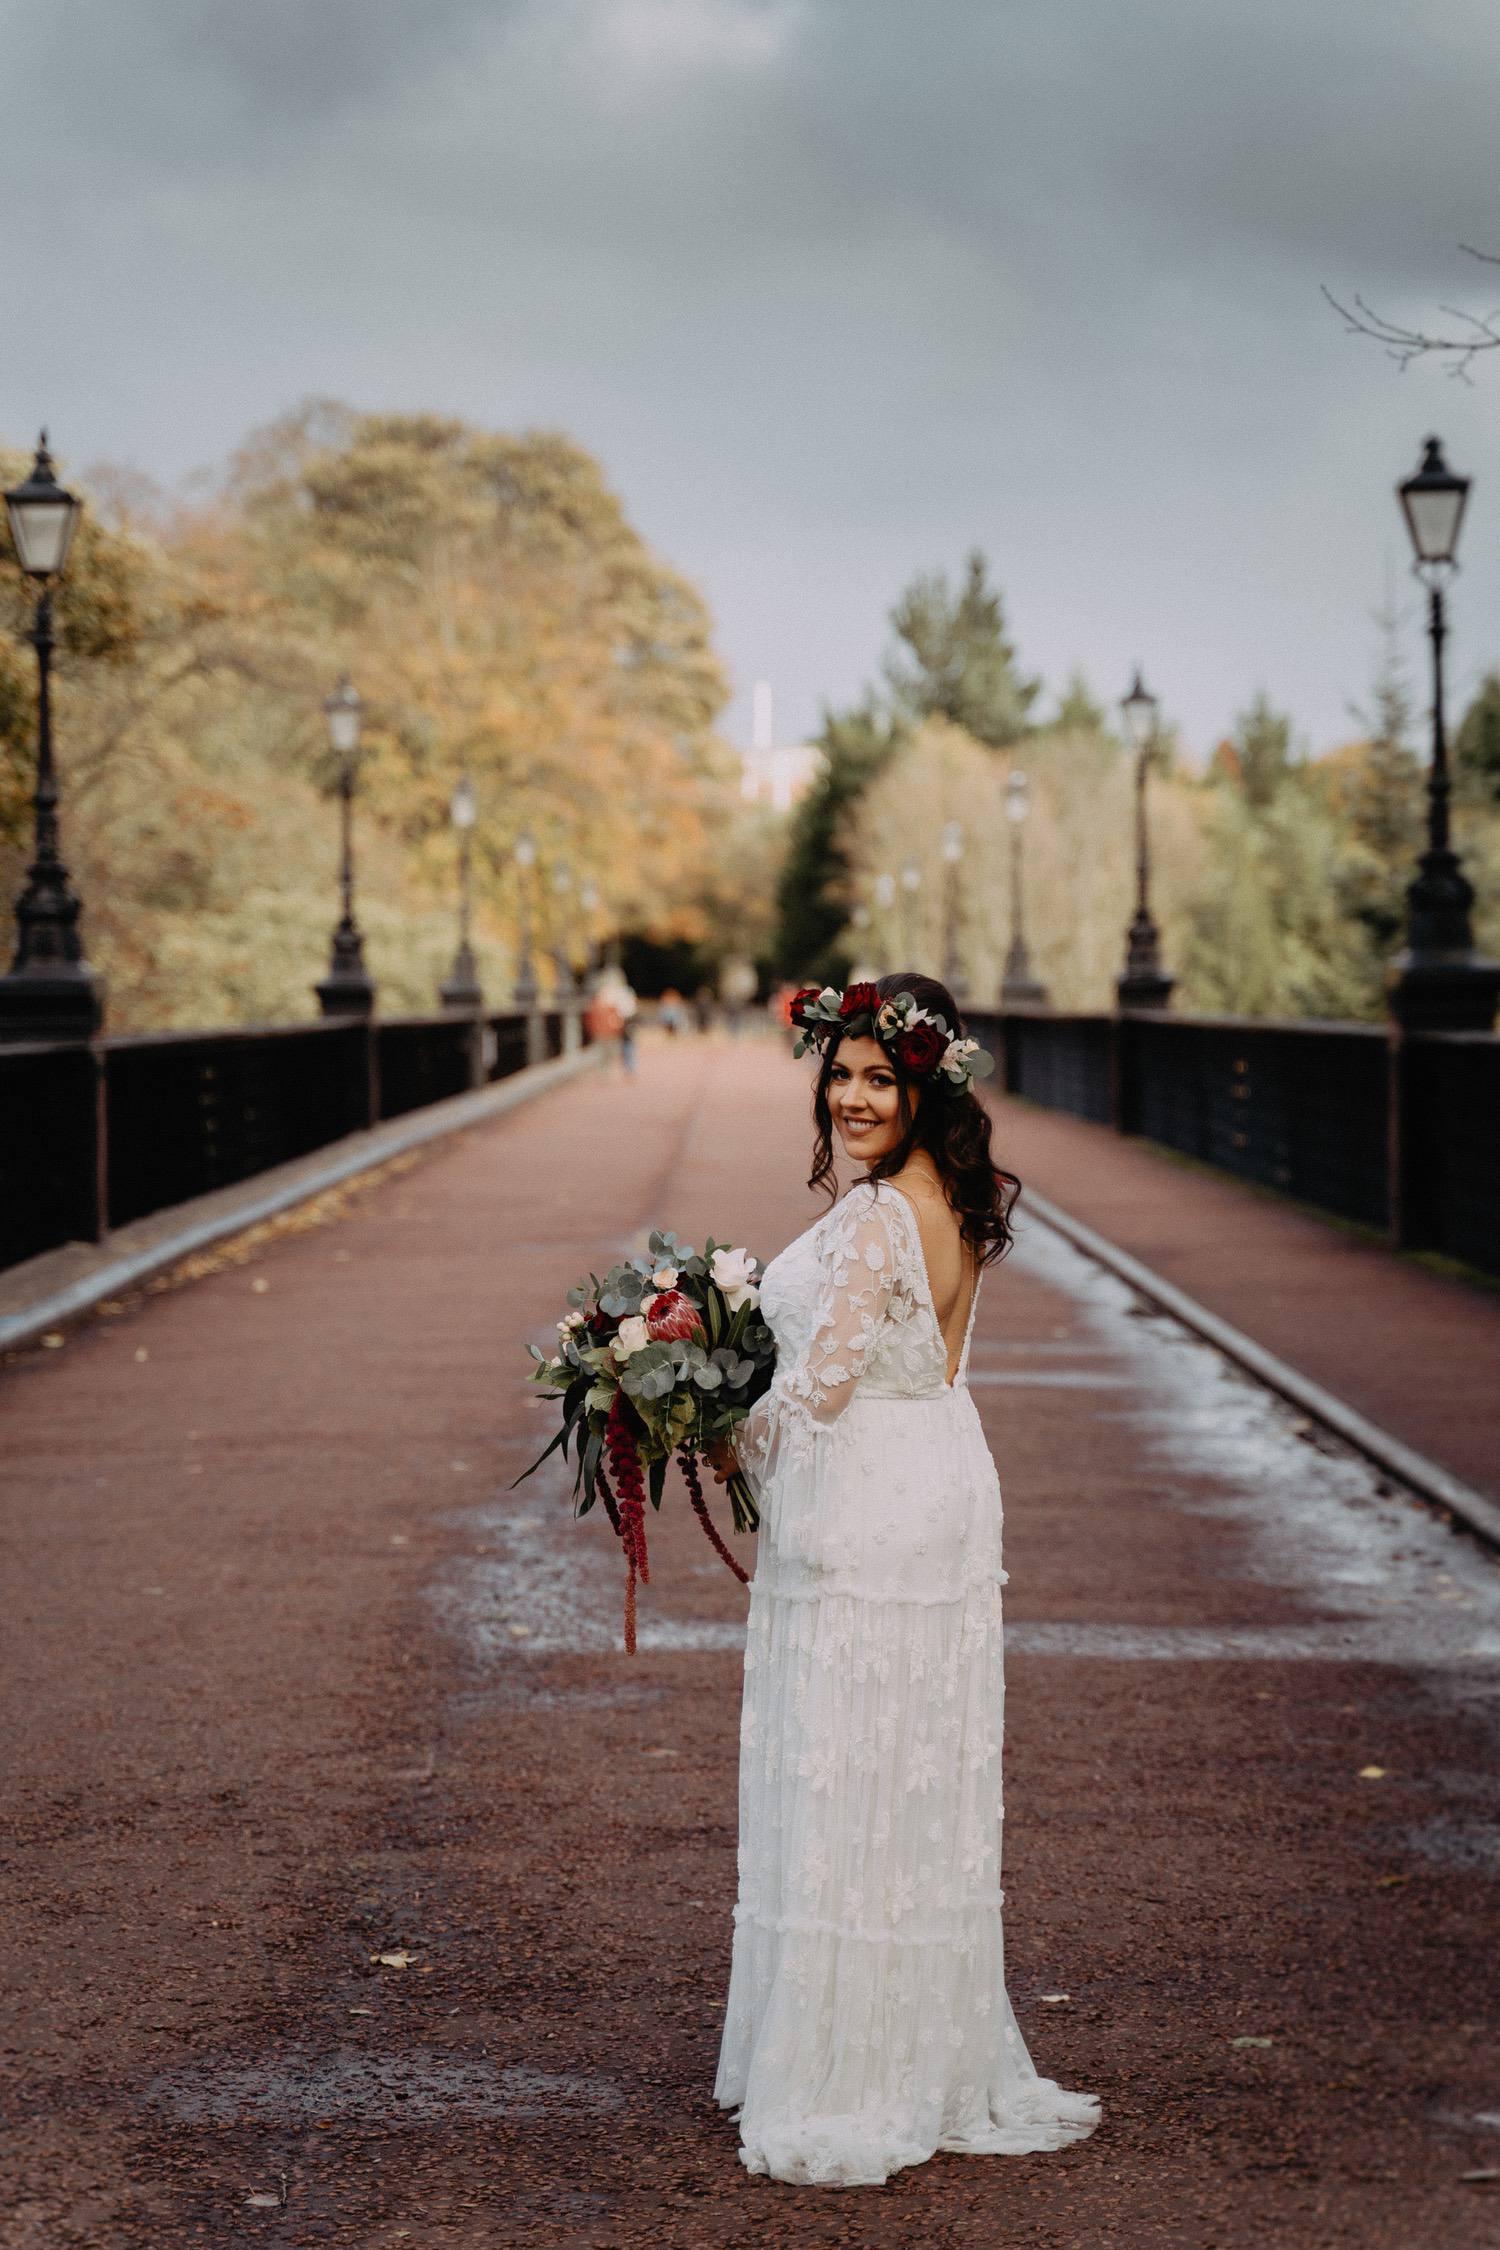 Wedding-Photographer-North-East-648.jpg